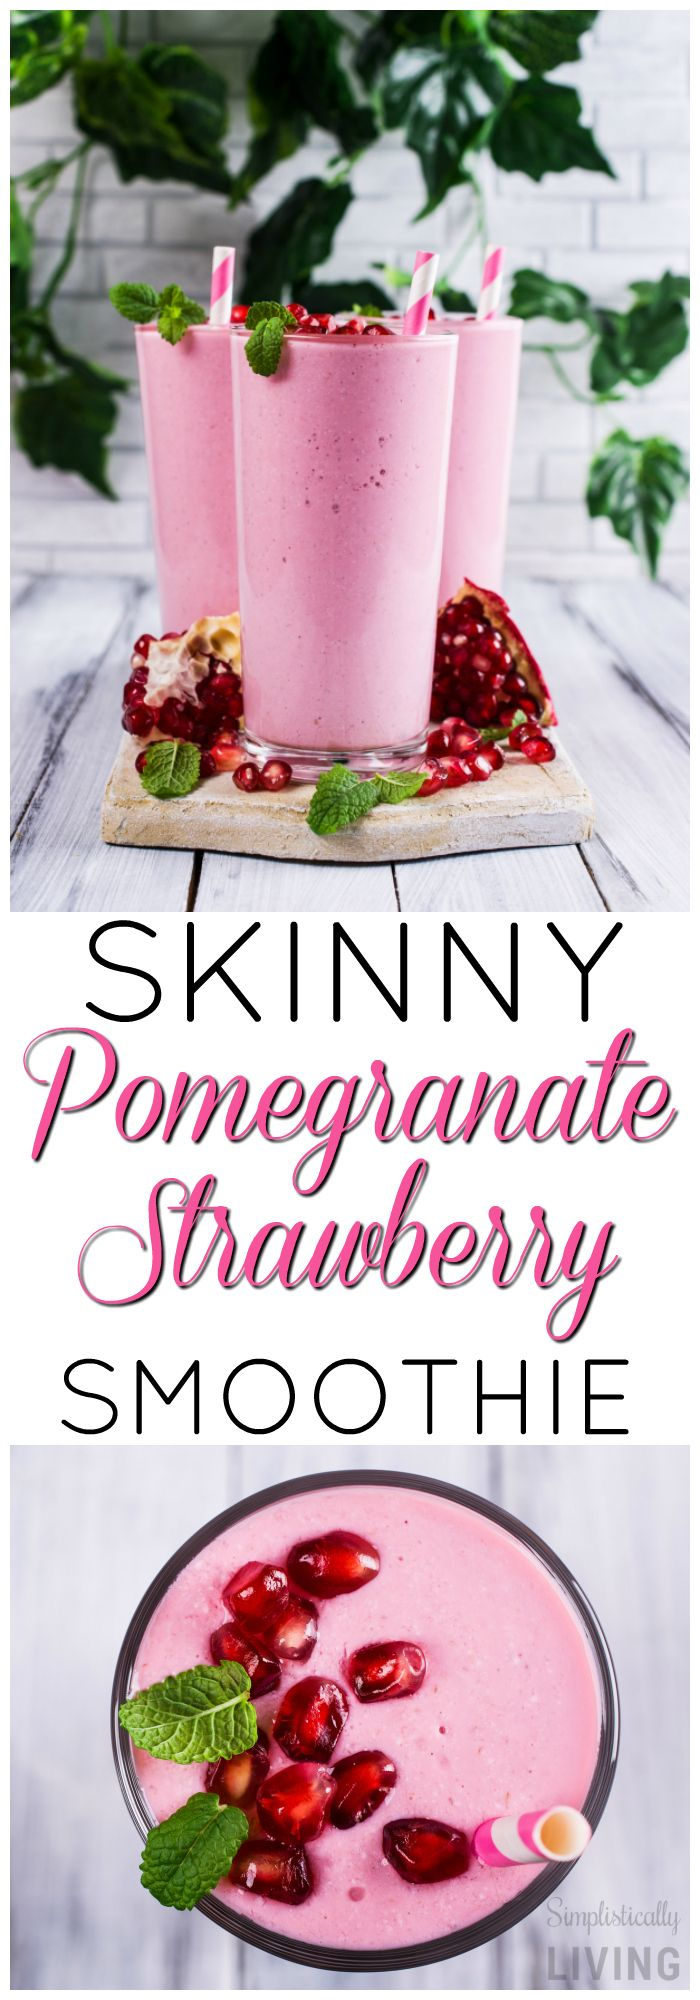 Smoothie King Pre Workout : smoothie, workout, Skinny, Pomegranate, Strawberry, Smoothie, Simplistically, Living, Smoothie,, Smoothies,